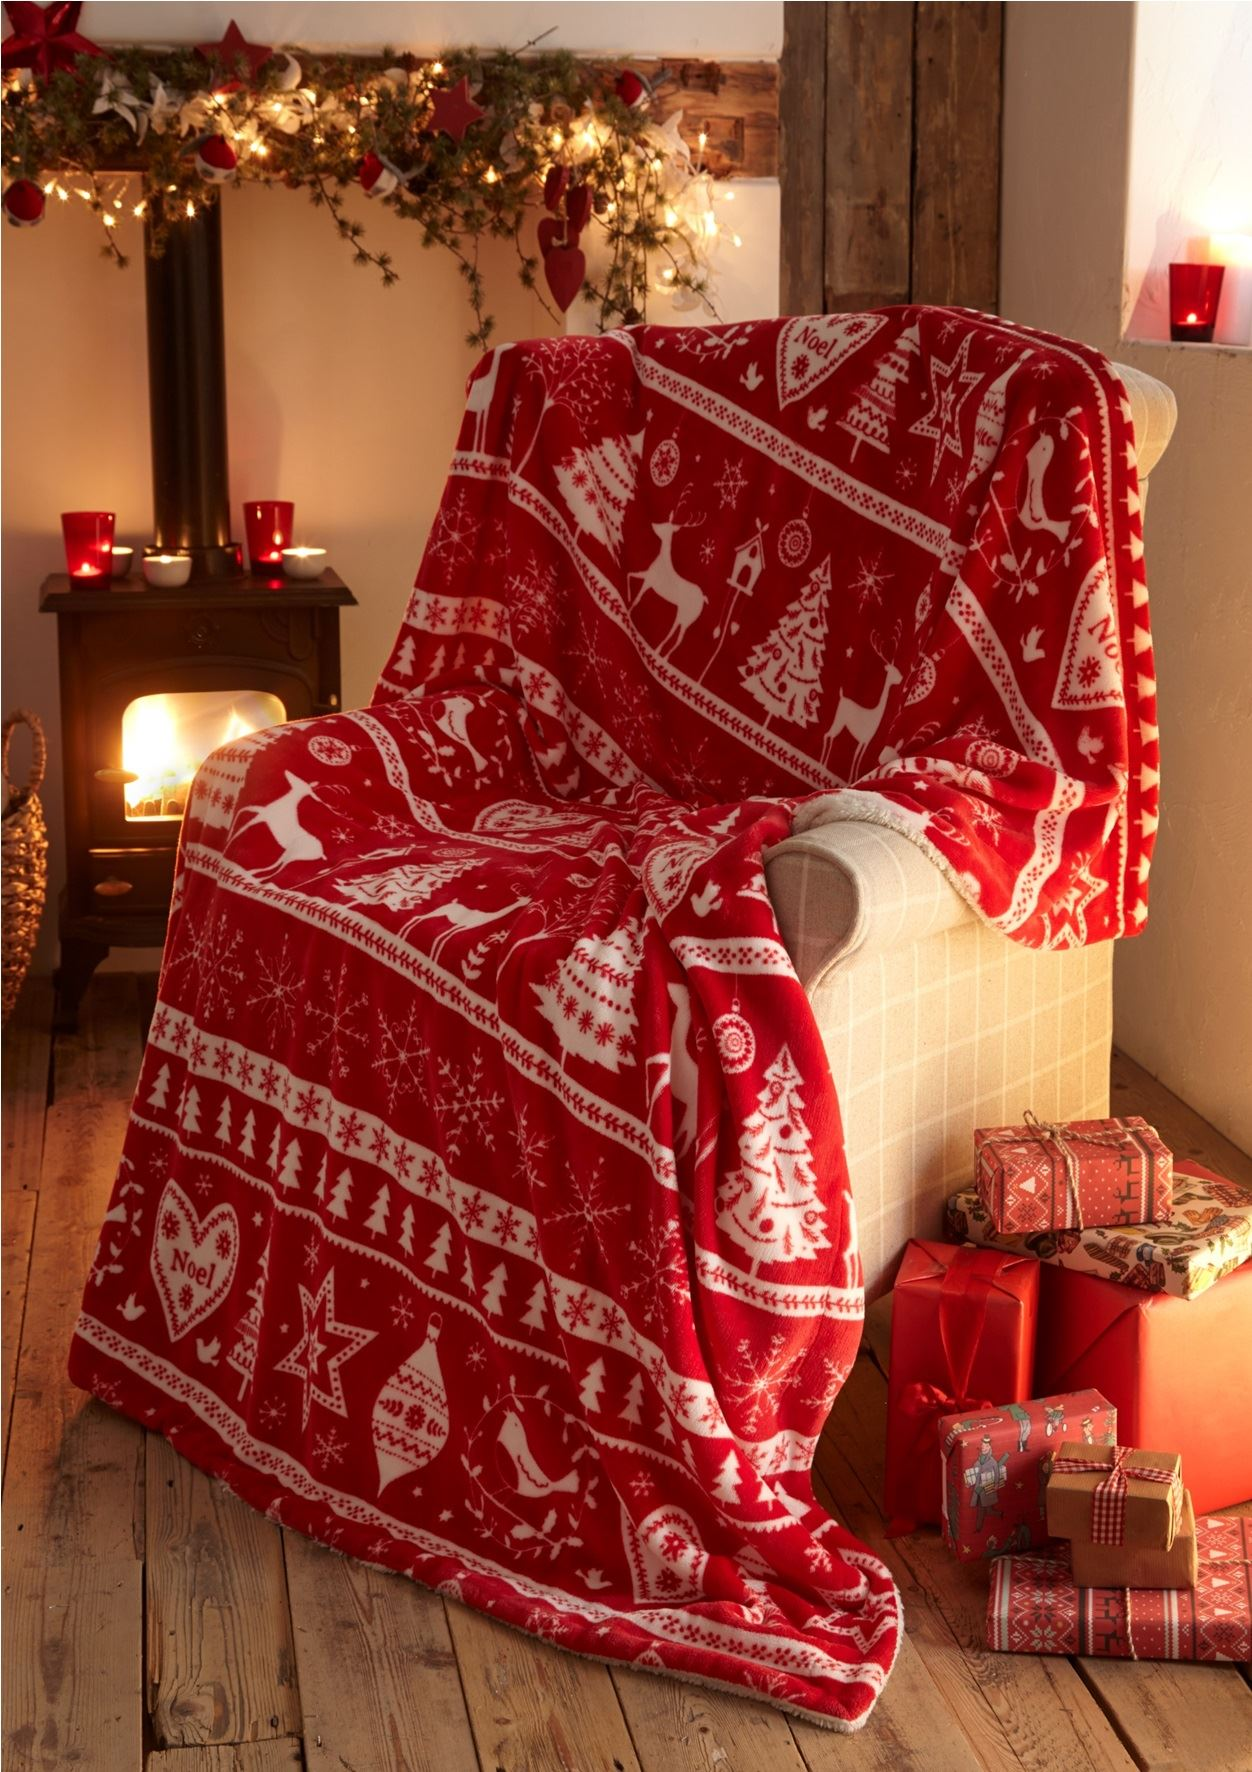 Christmas Soft Fleece Throws Decorative Bed Sofa Blanket Xmas Father Christmas Ebay